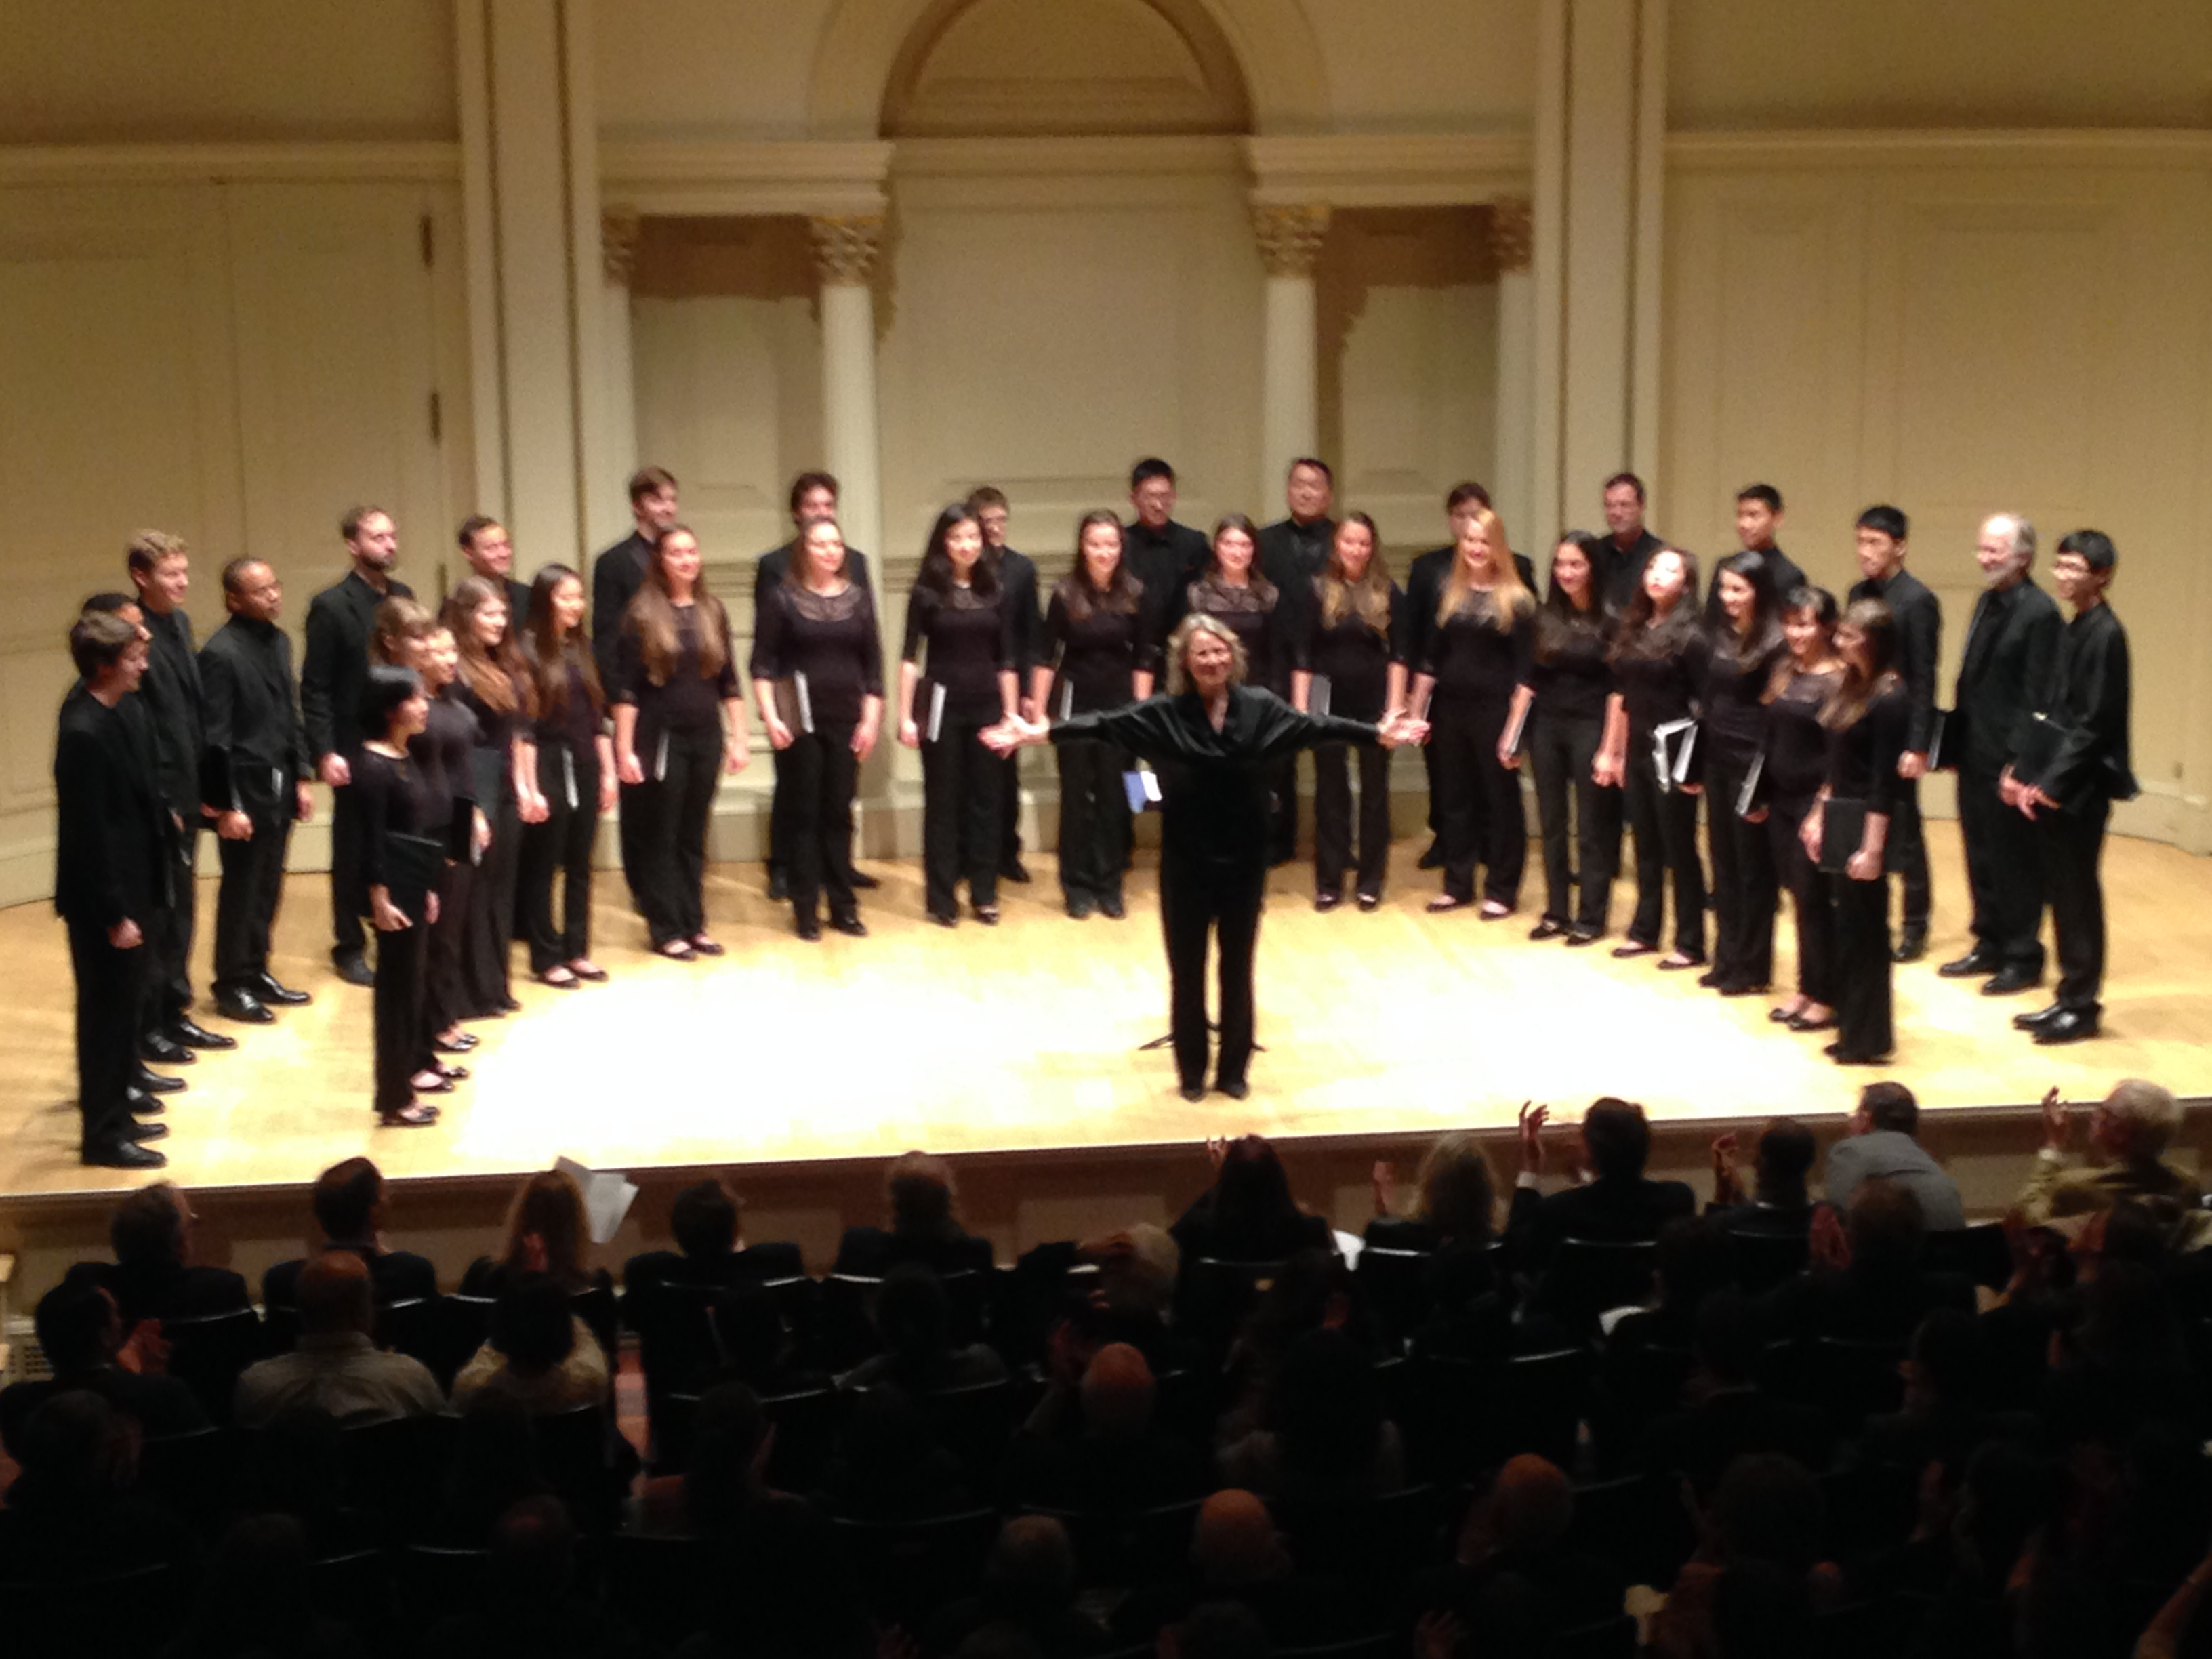 New York | New York Concert Review, Inc